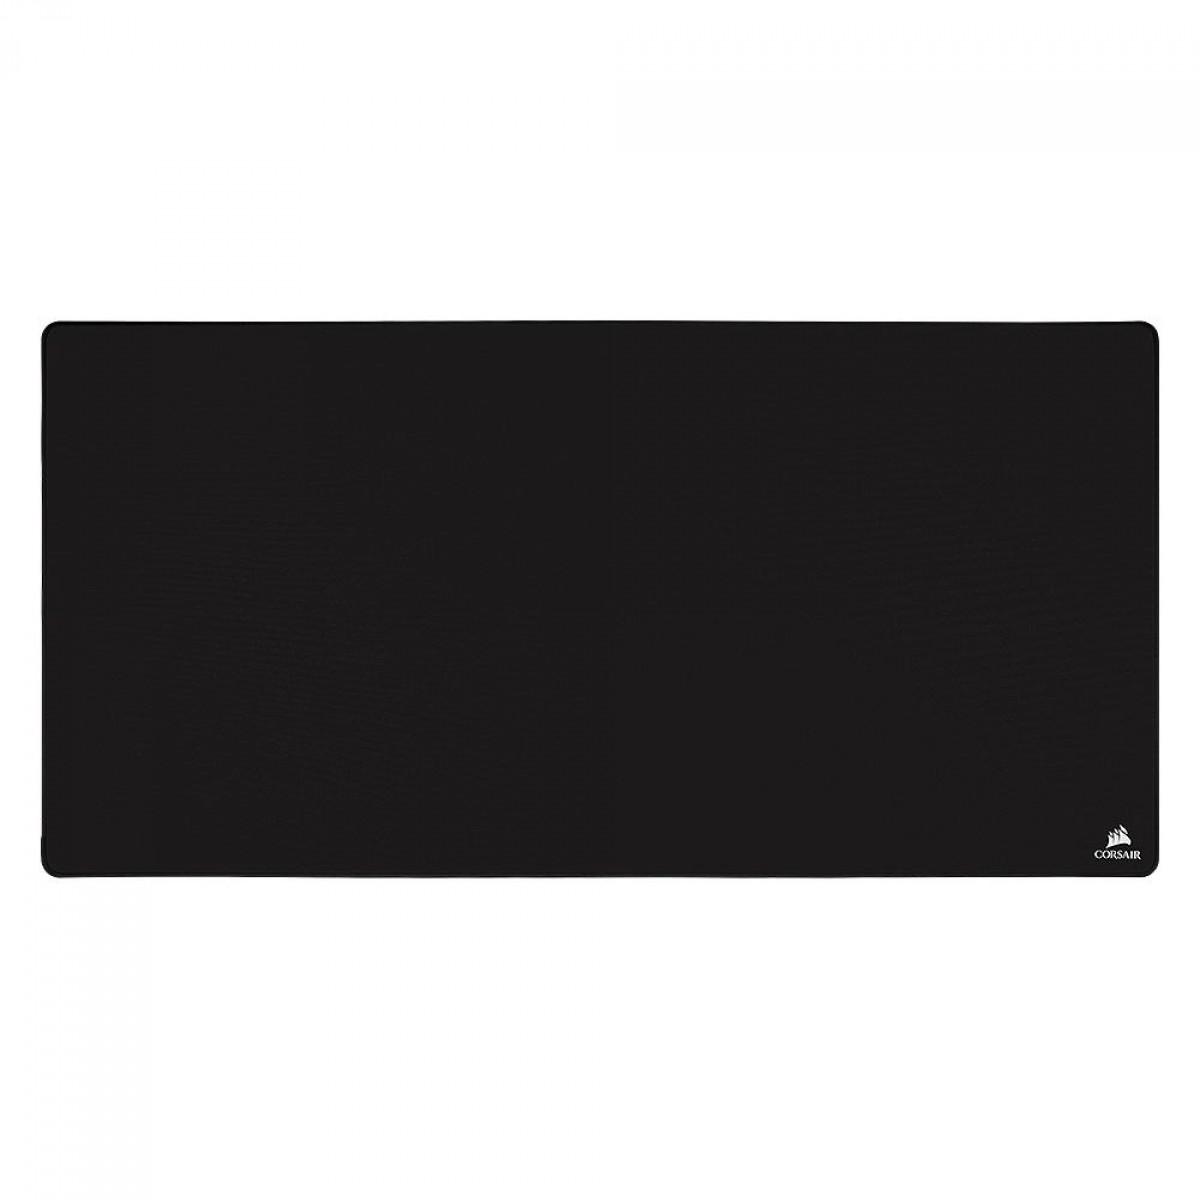 Mousepad Gamer Corsair MM500 Premium, Estendido, Black, CH-9415080-WW